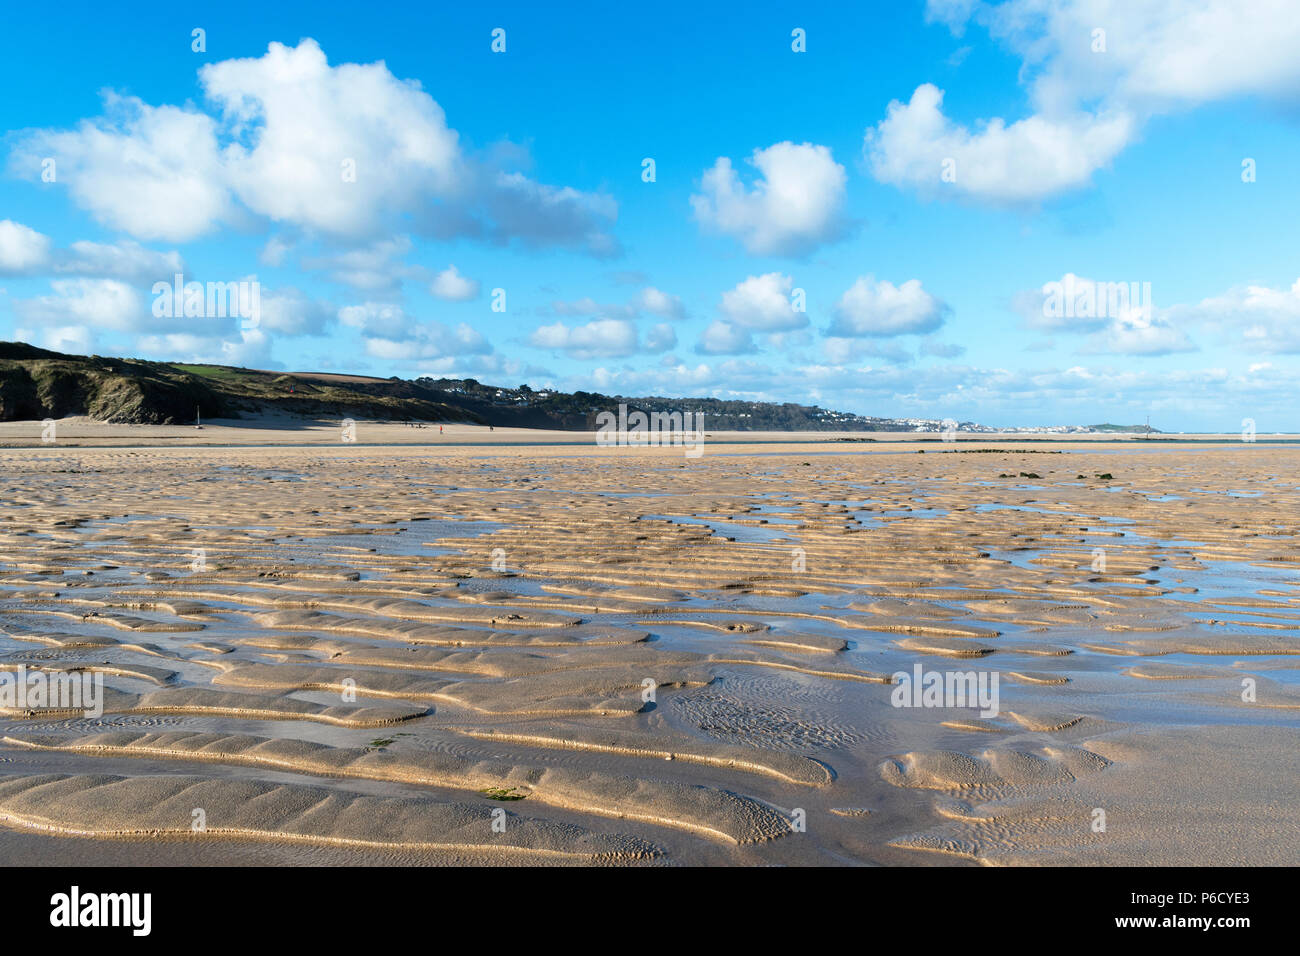 porth kidney sands, st.ives bay, lelant, hayle, cornwall, england, britain, uk. - Stock Image